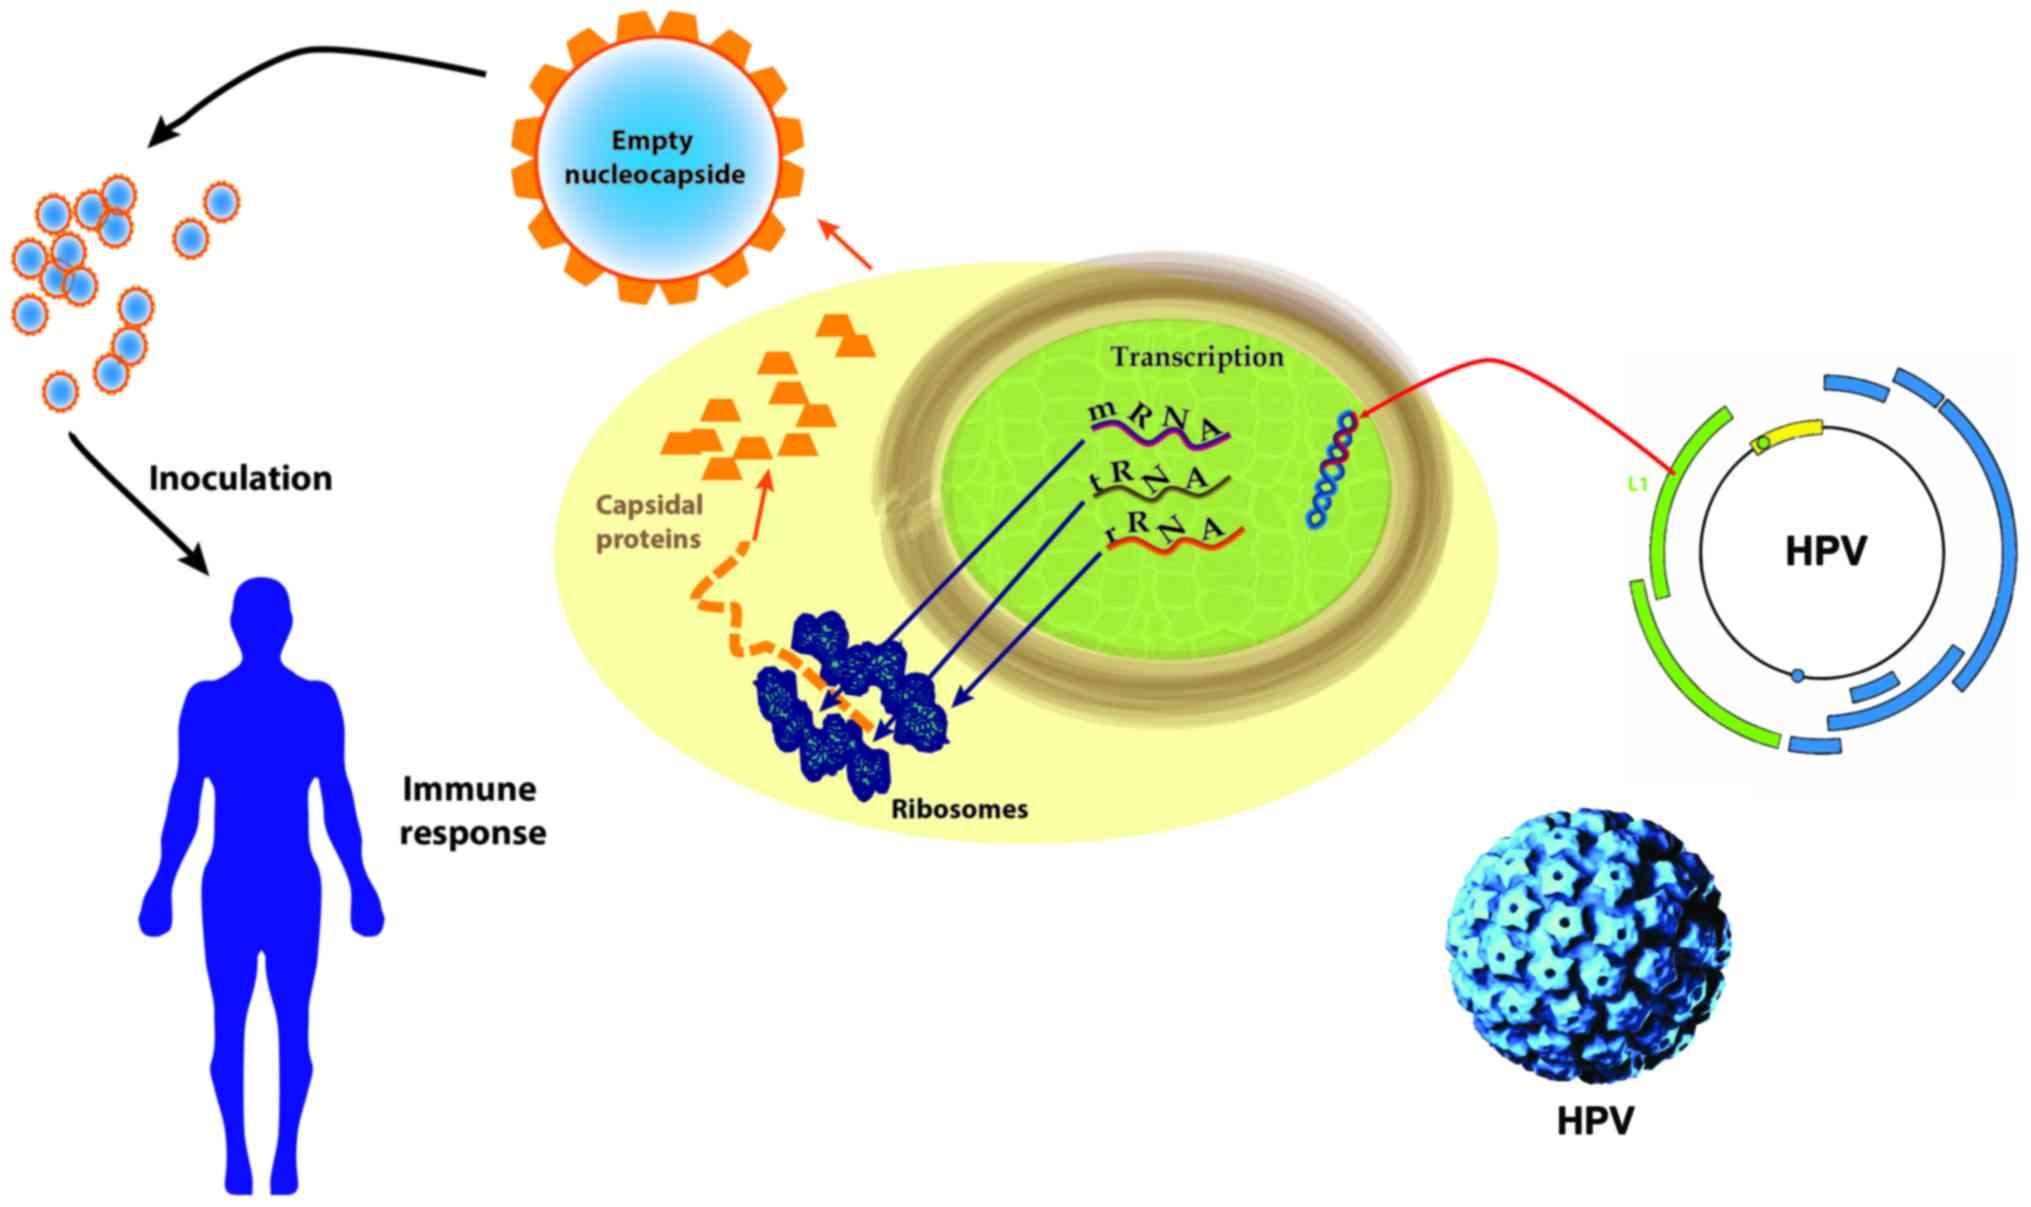 hpv (human papillomavirus) vaccine gardasil